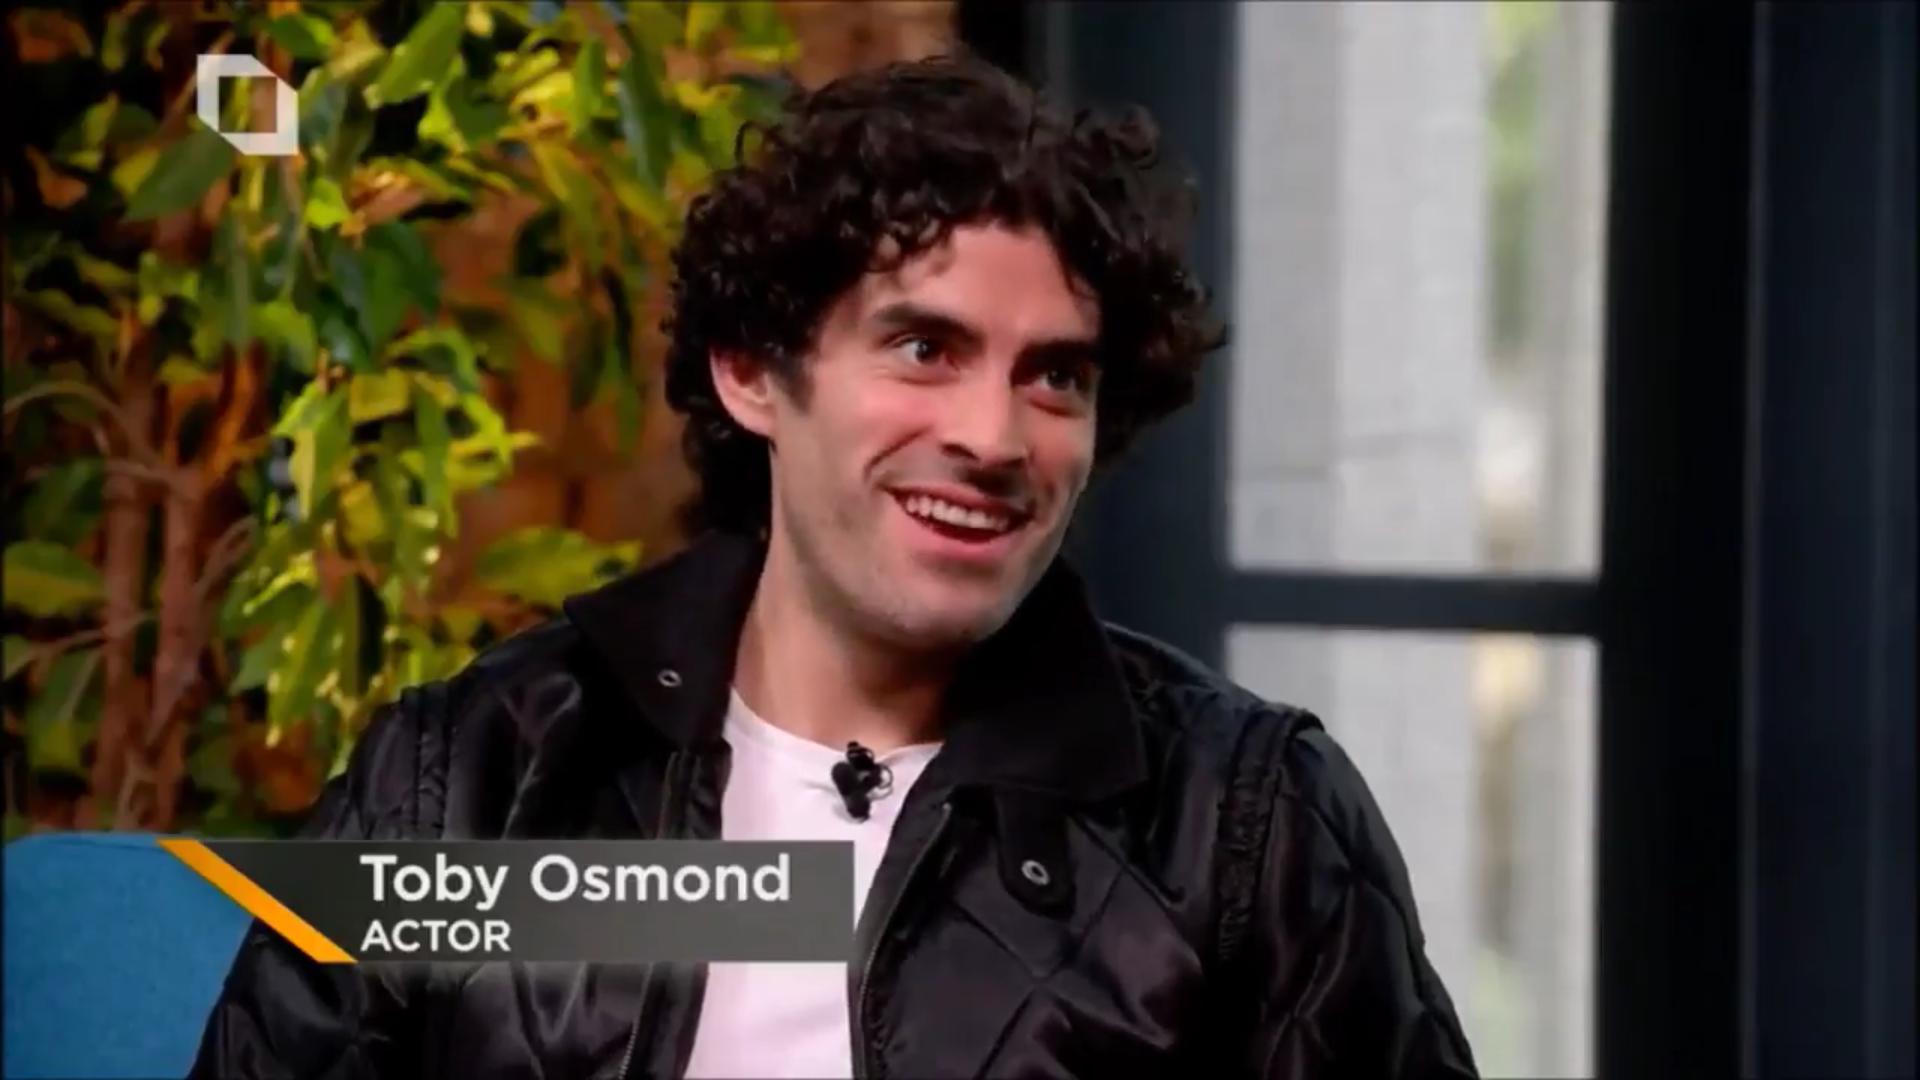 Toby Osmond actor